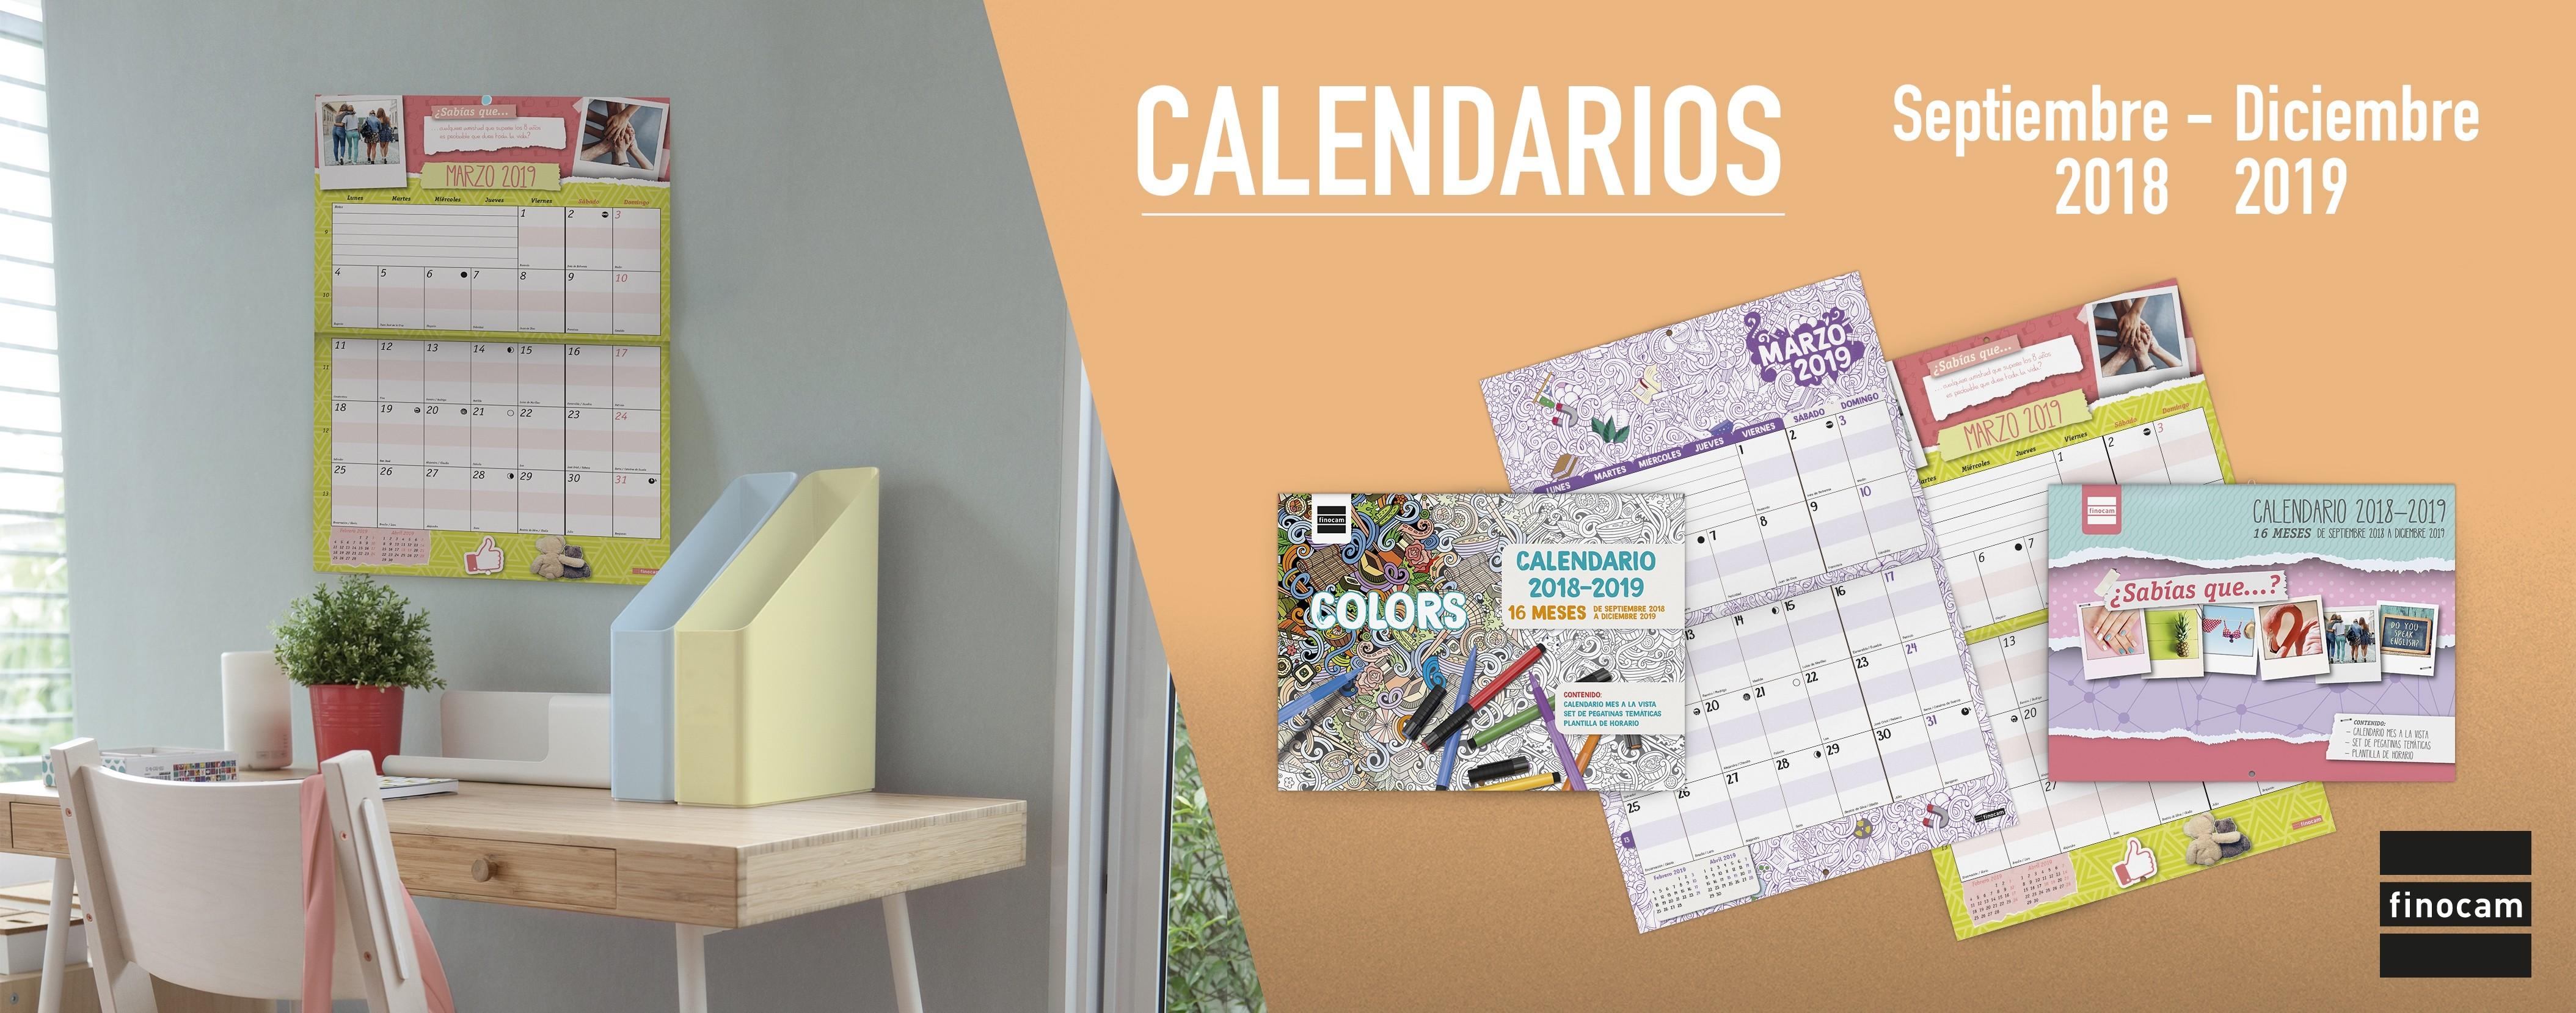 Calendario 2019 Imprimir Bolsillo Más Populares Agendas Y Calendarios Finocam Of Calendario 2019 Imprimir Bolsillo Más Arriba-a-fecha Calendario Chile A±o 2019